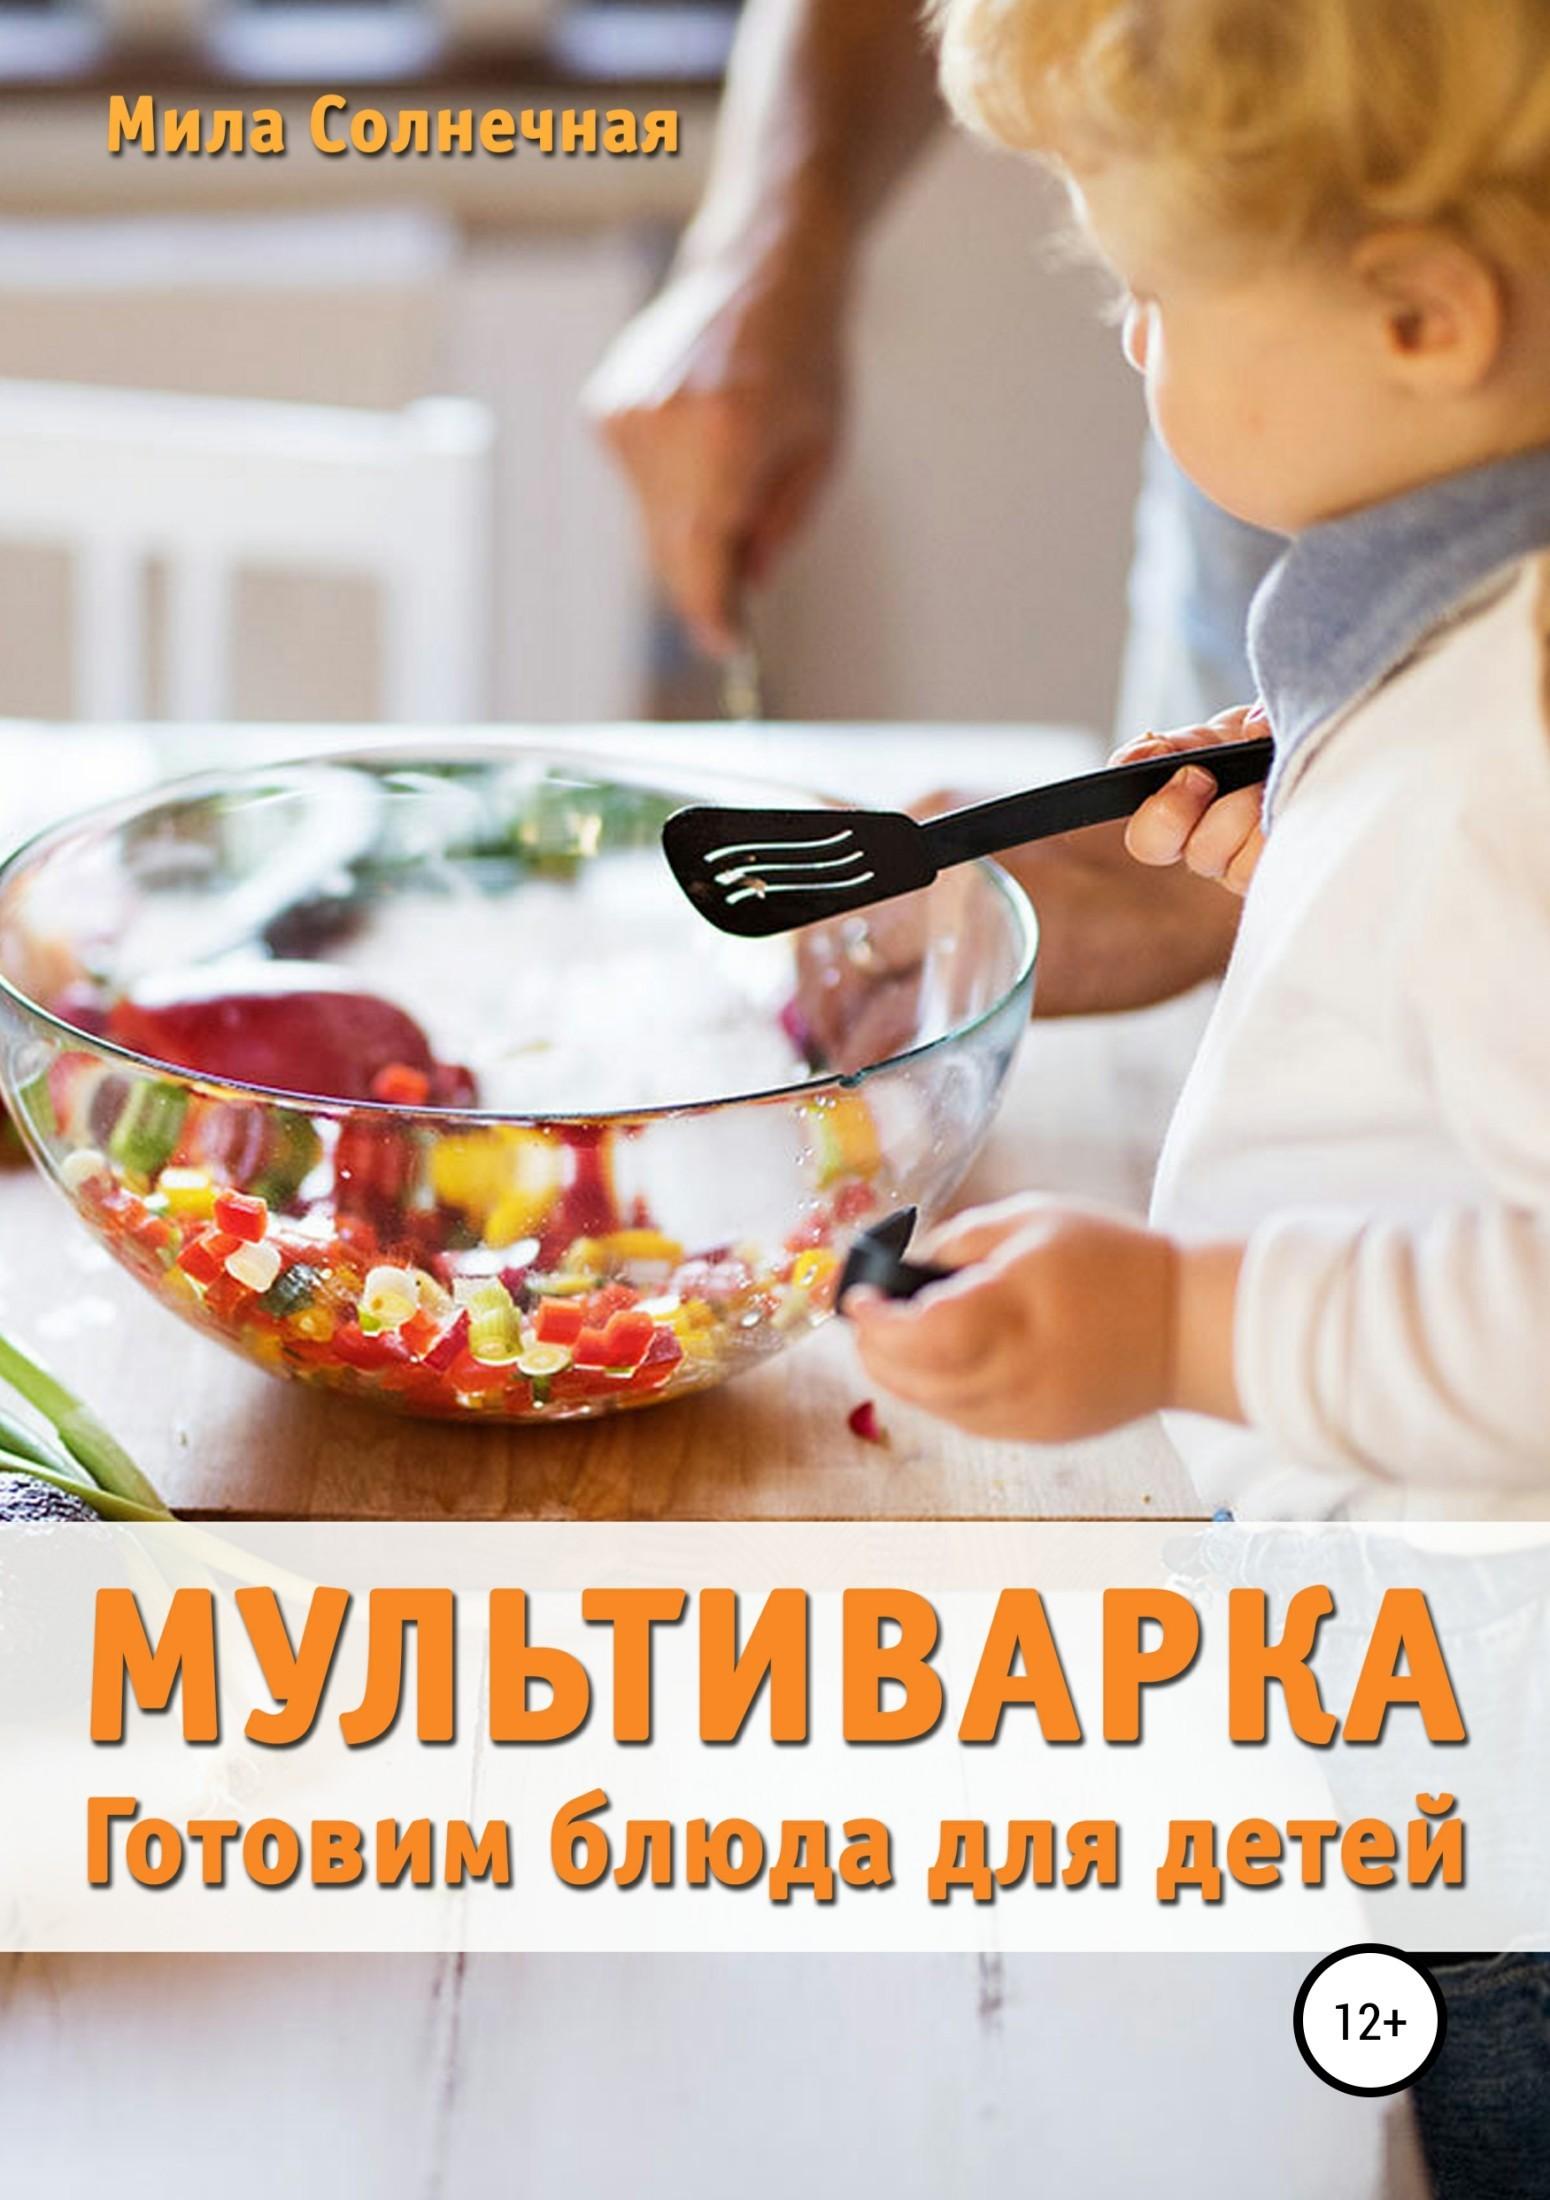 Мультиварка. Готовим блюда для детей